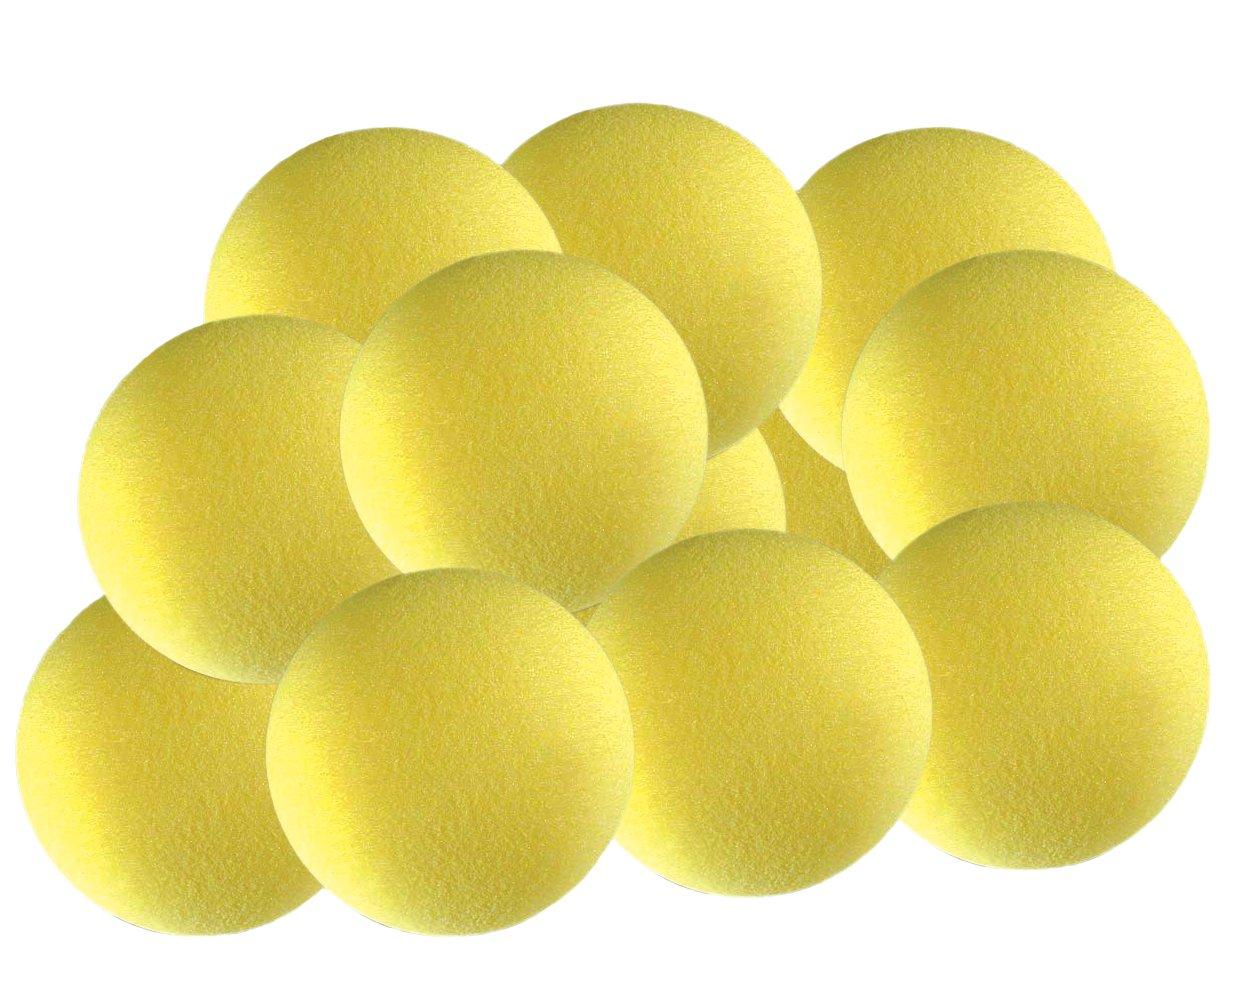 Tourna 12 Pack Foam Balls 12 Pack